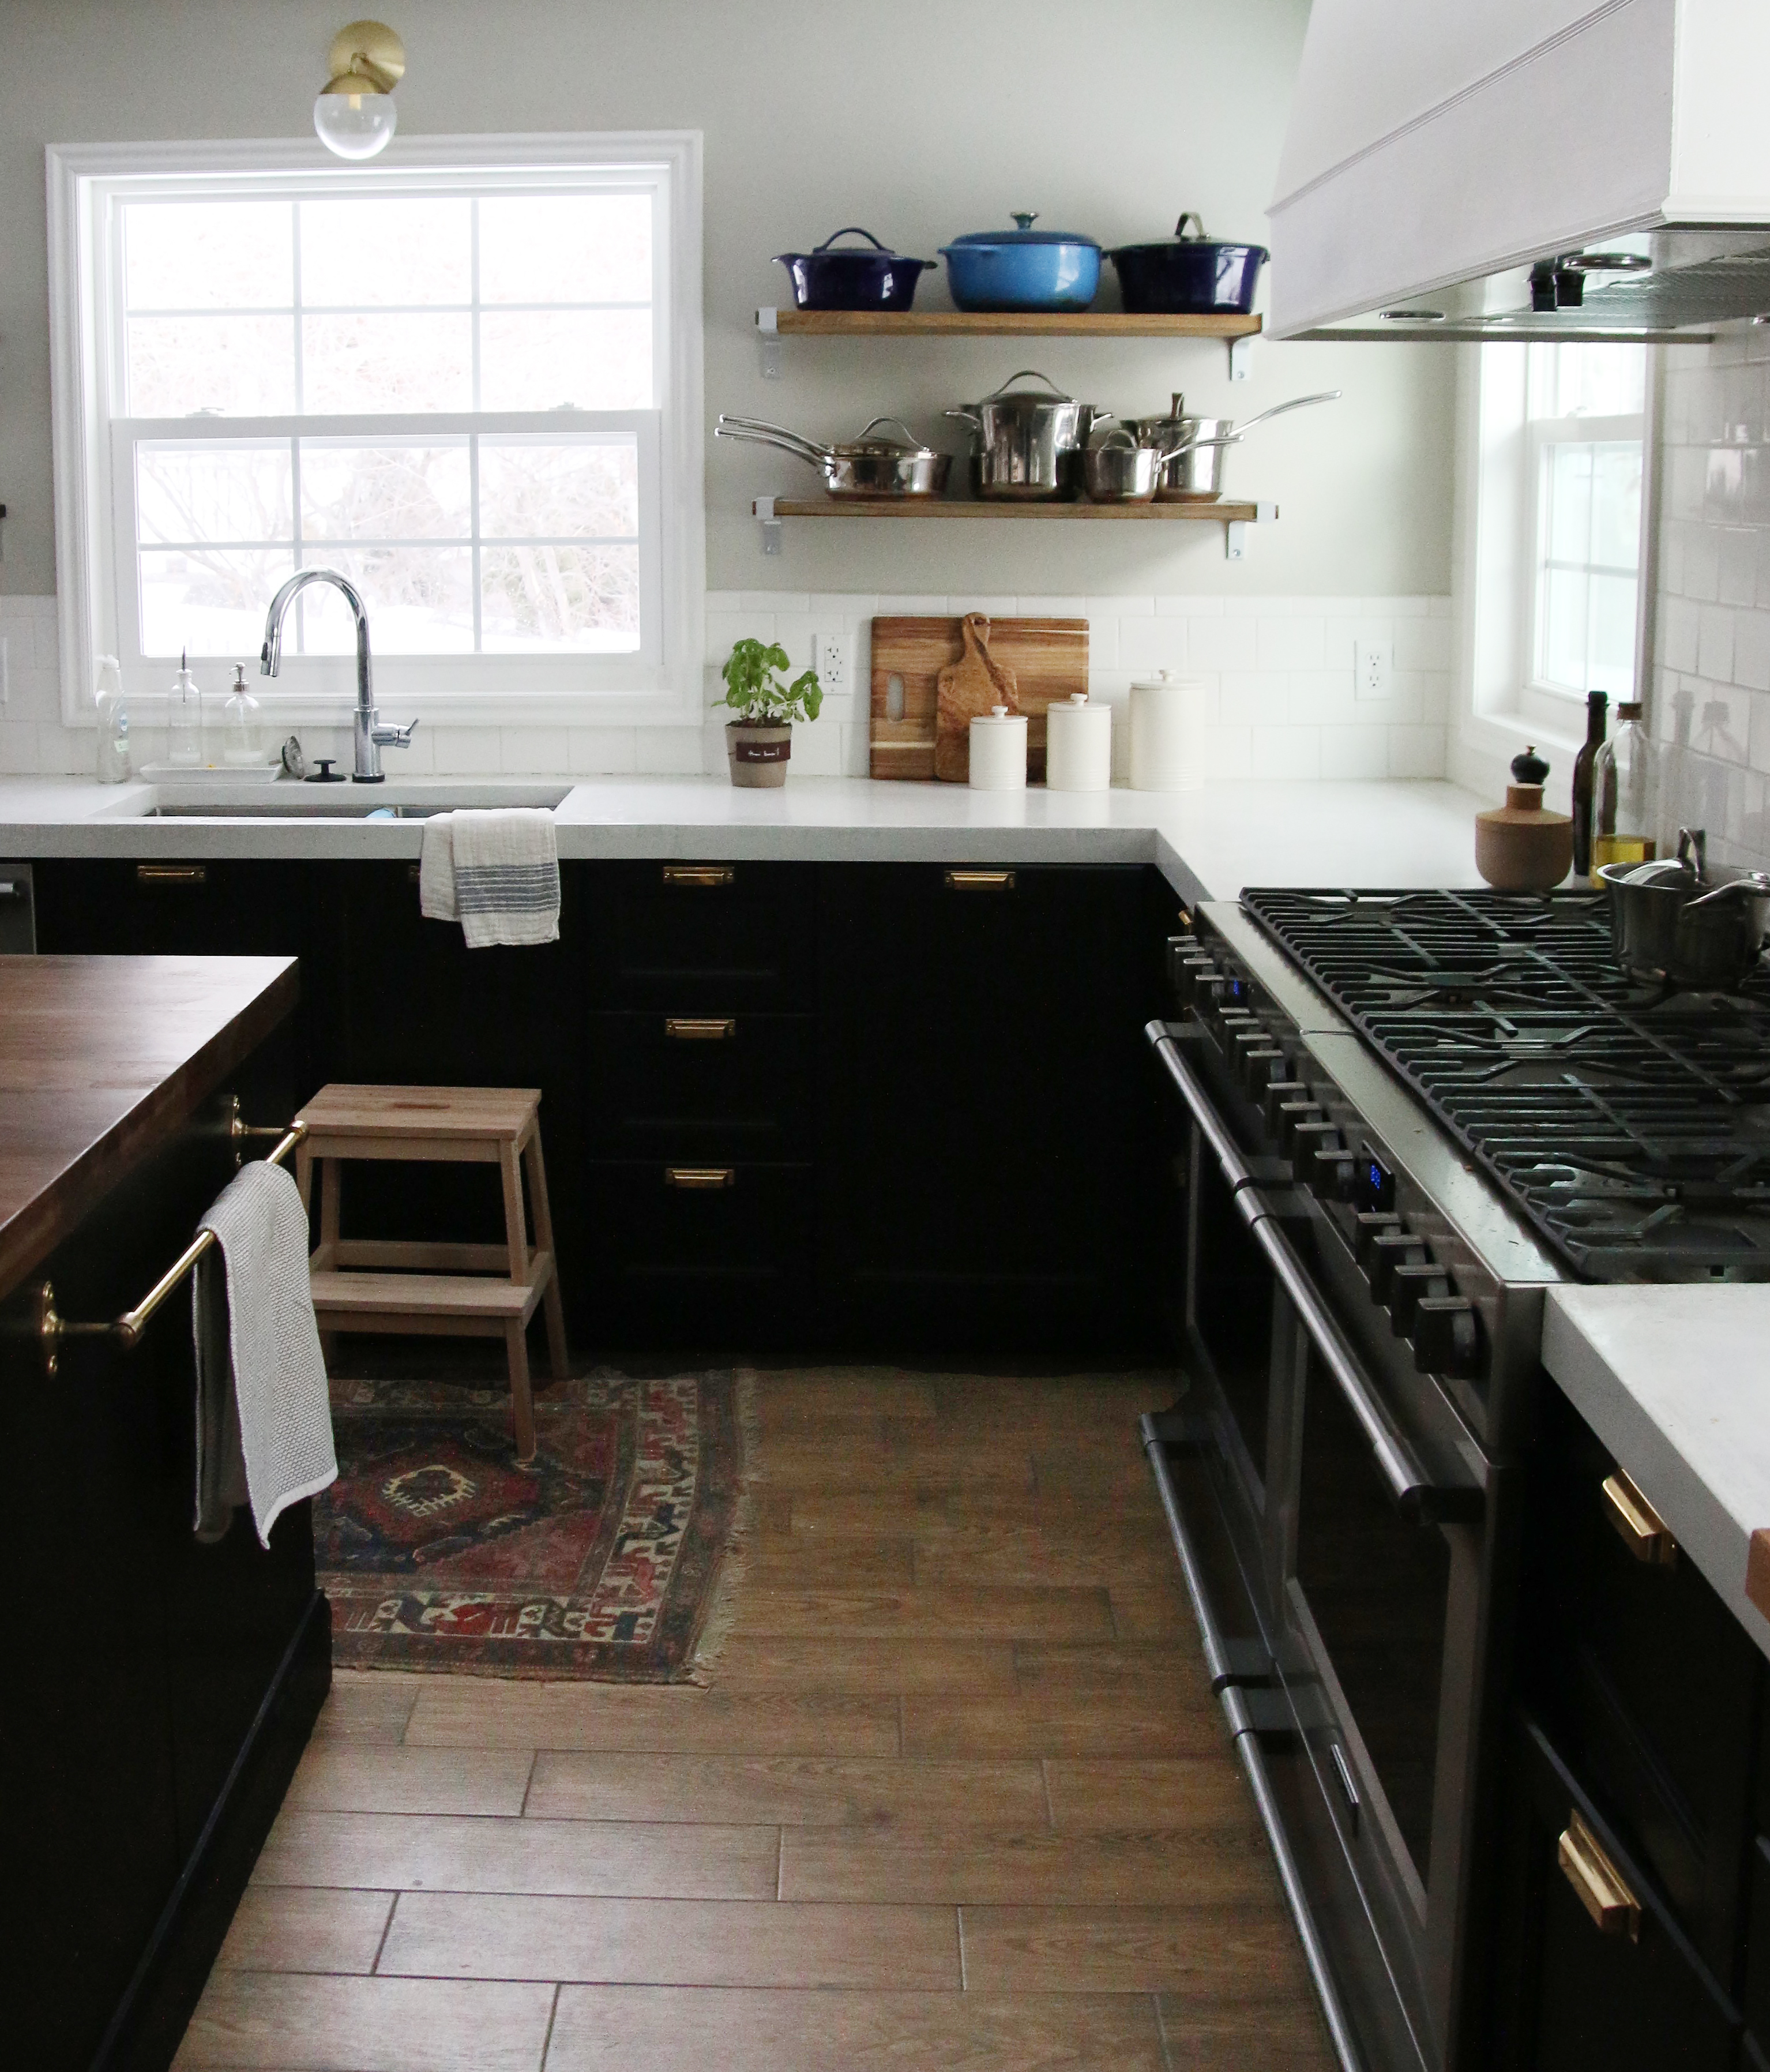 IKEA Kitchen NYC | Kitchen Cabinets | Kitchen Remodel ...